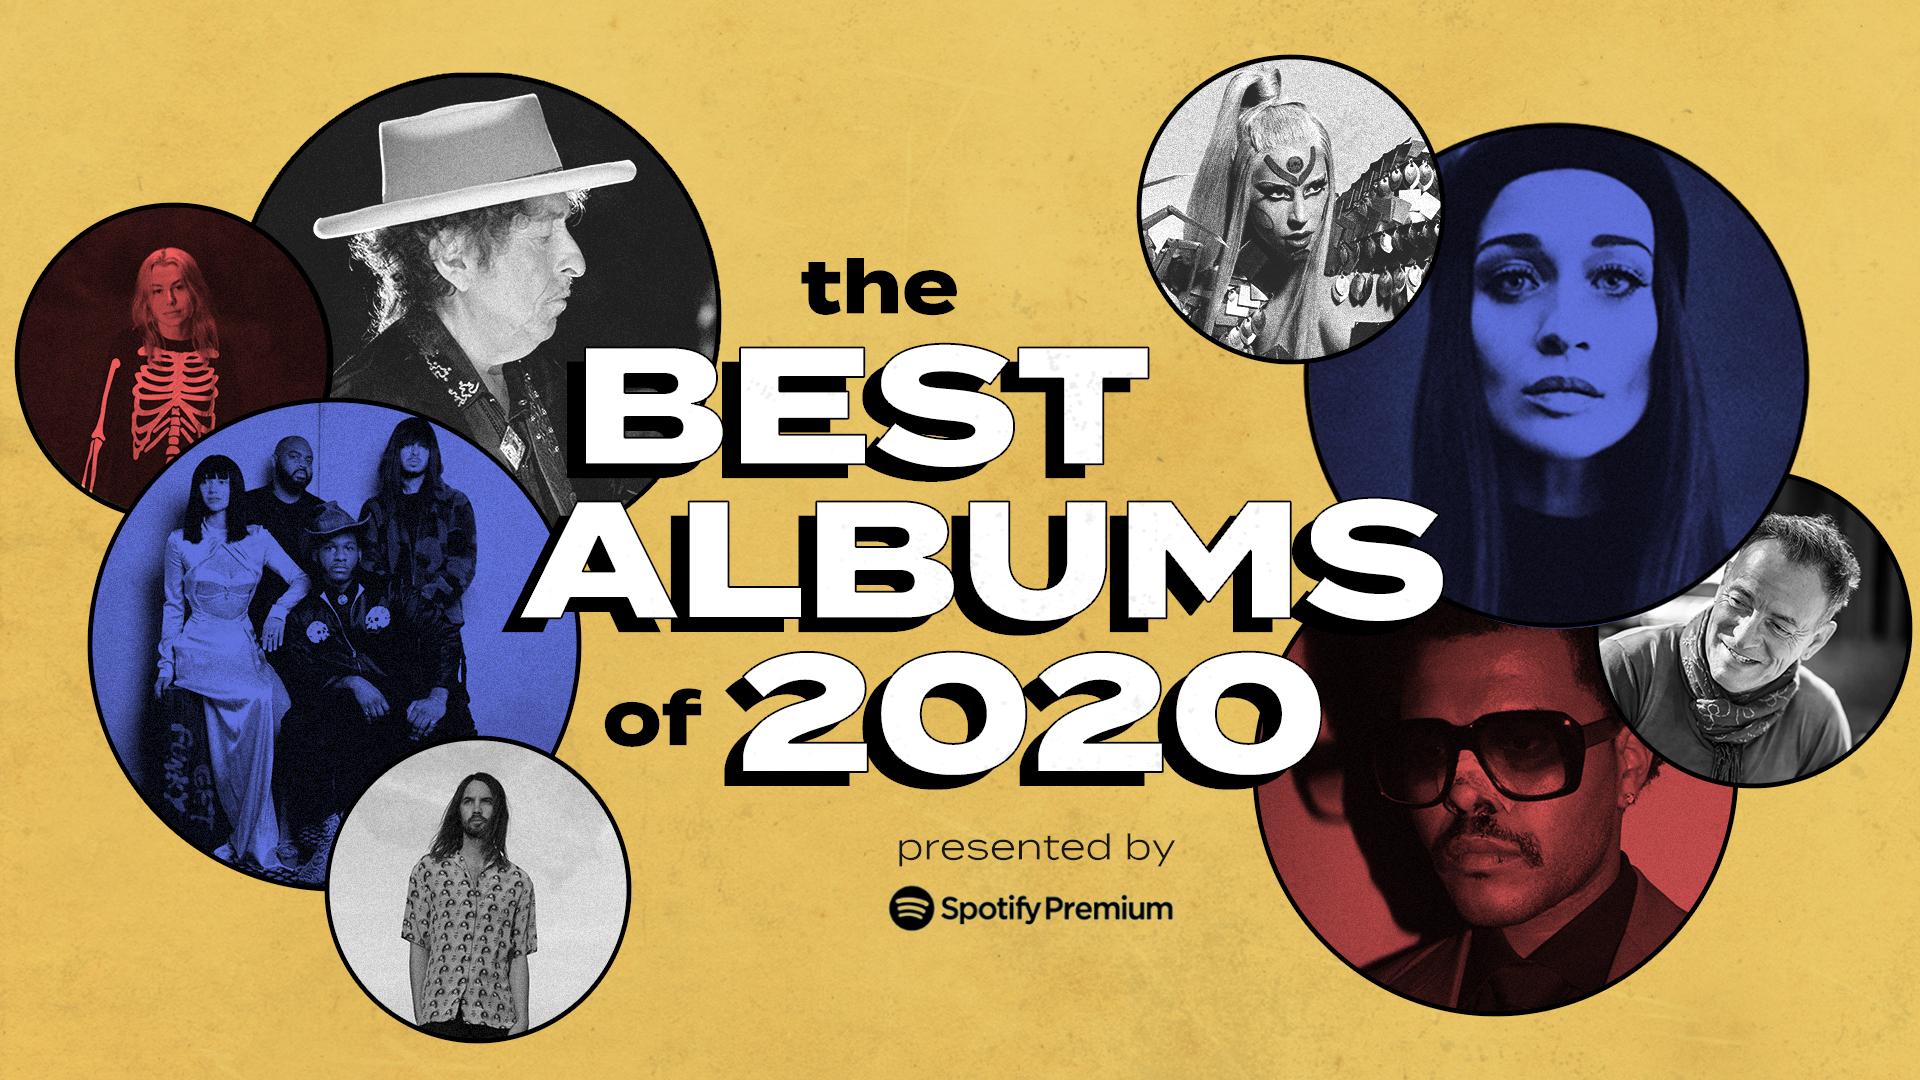 best albums of 2020